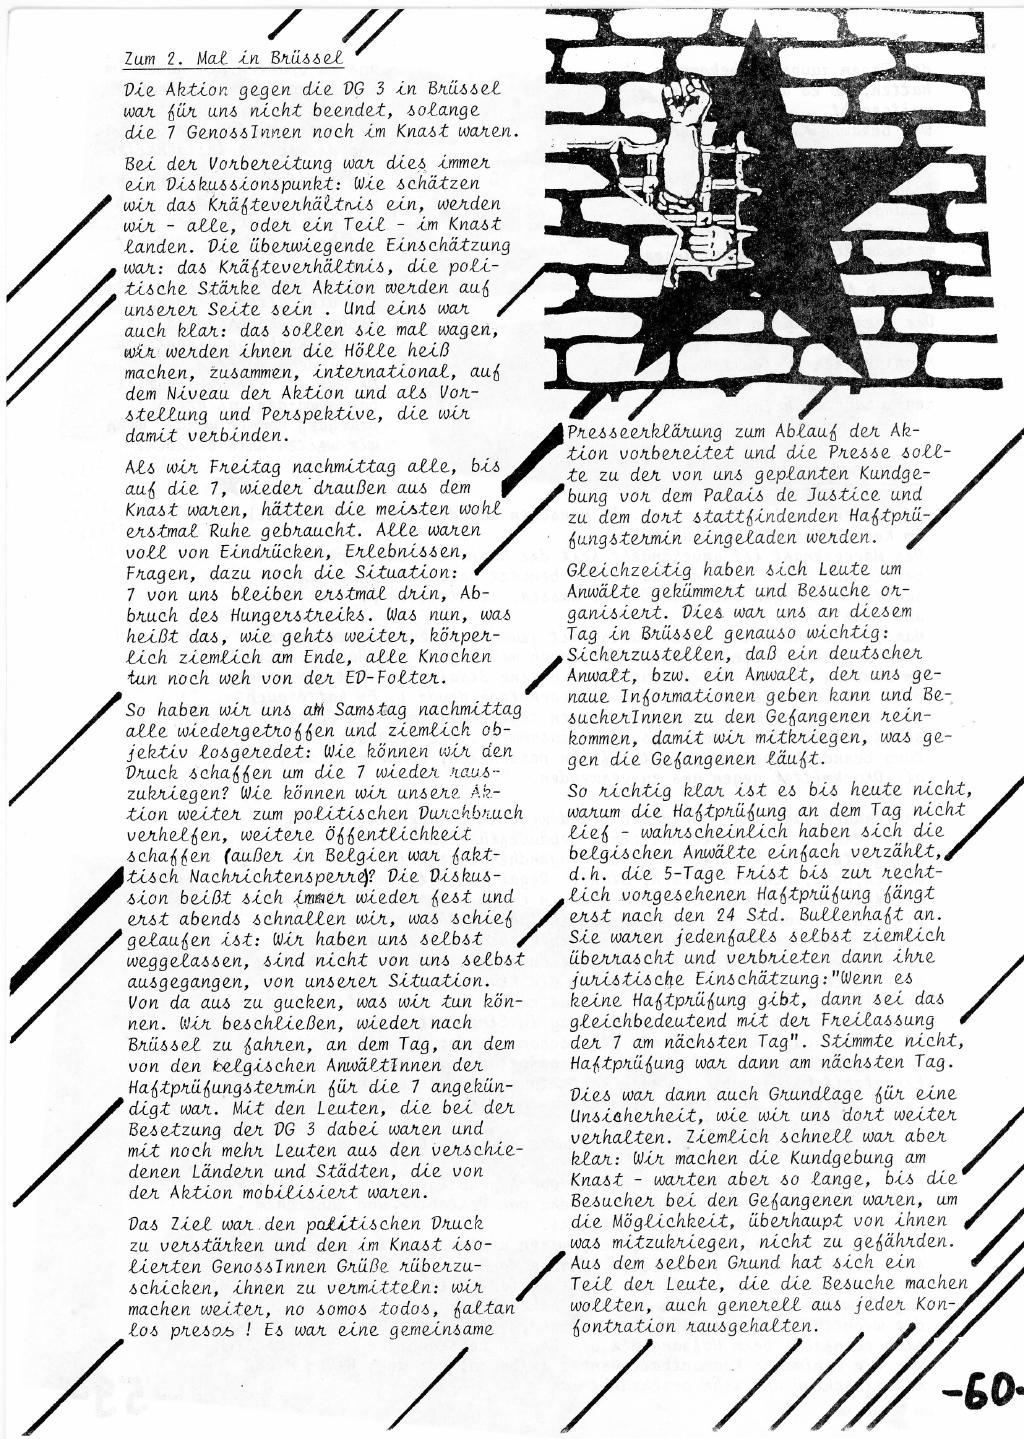 Belgien_Doku_Besetzung_EG_Kommission_1989_062